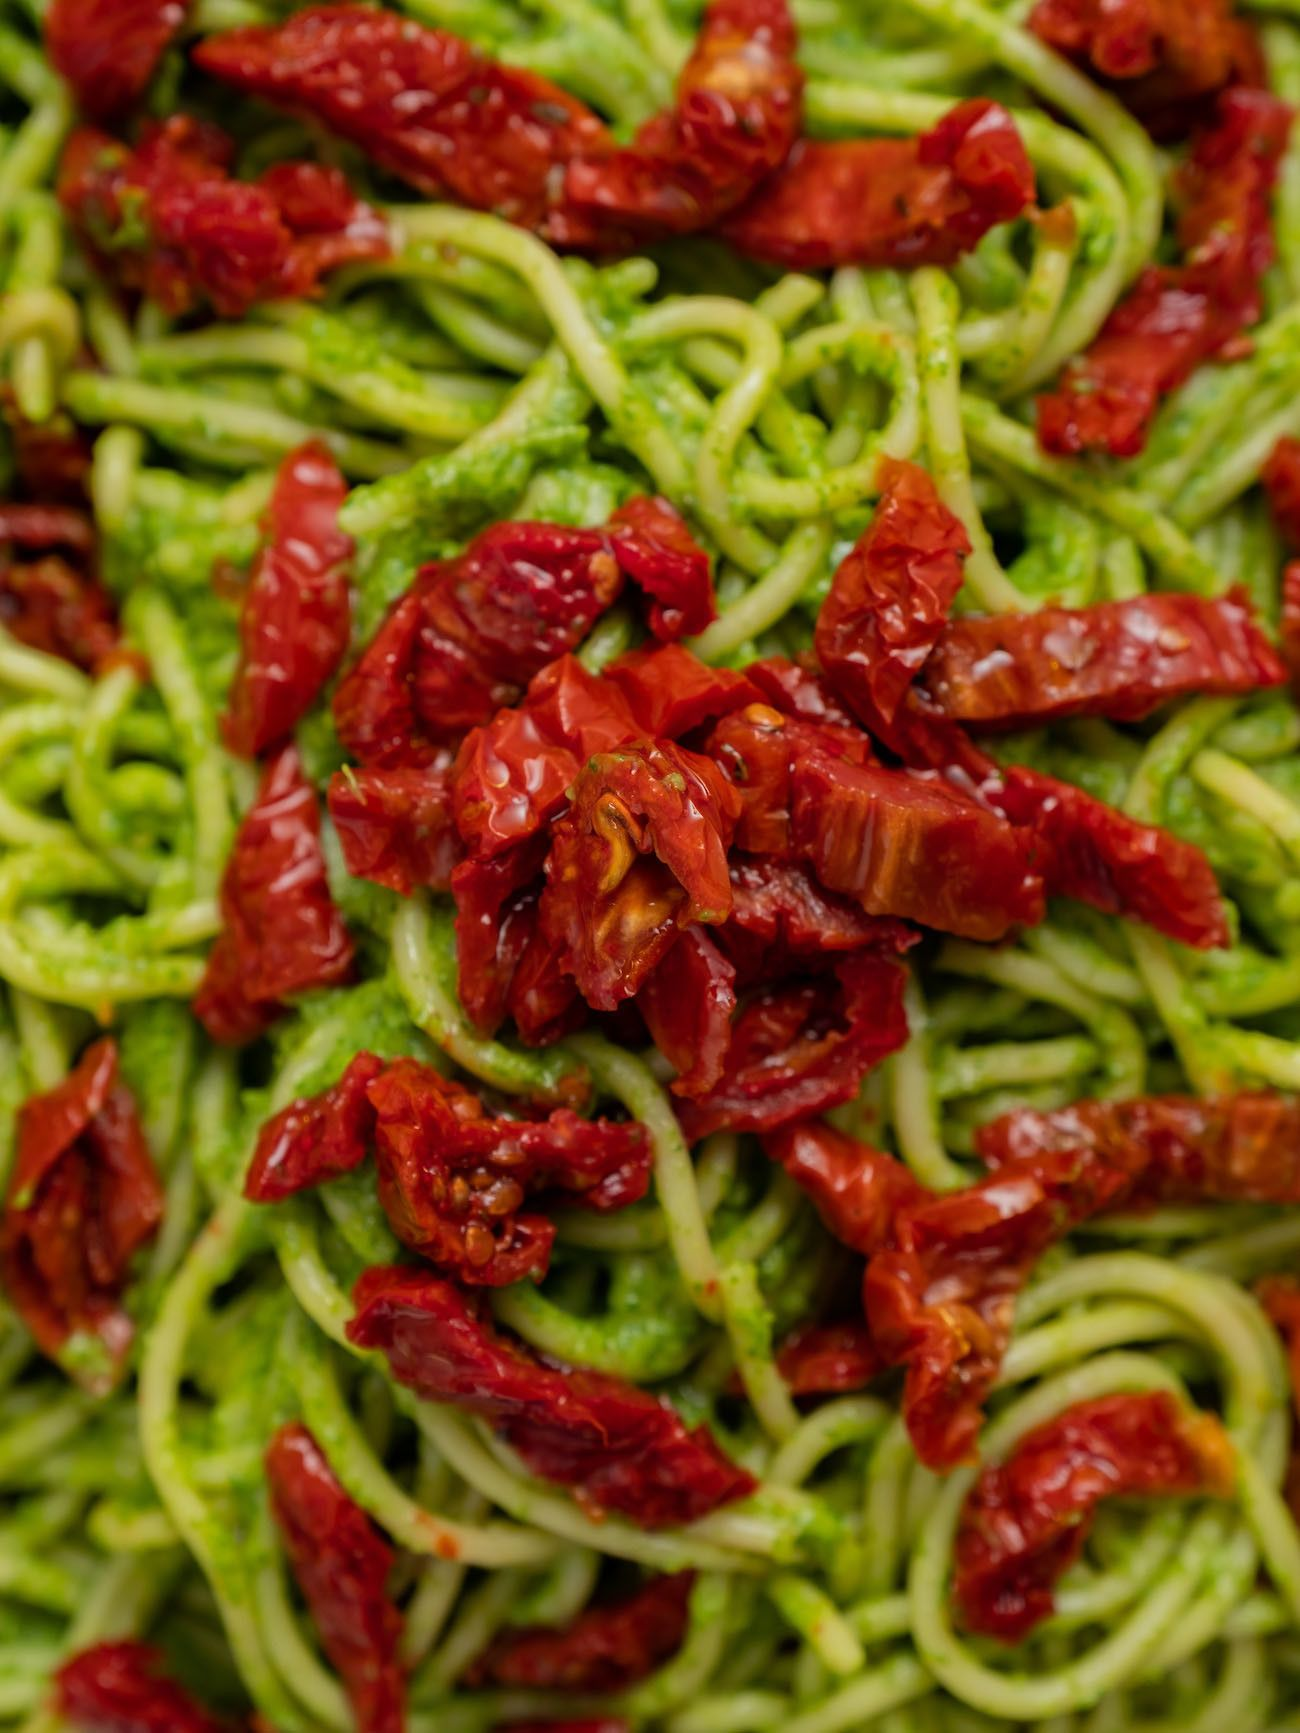 Foodblog, Rezept Spaghetti mit Avocado-Rucola-Pesto und getrockenten Tomaten, Pasta